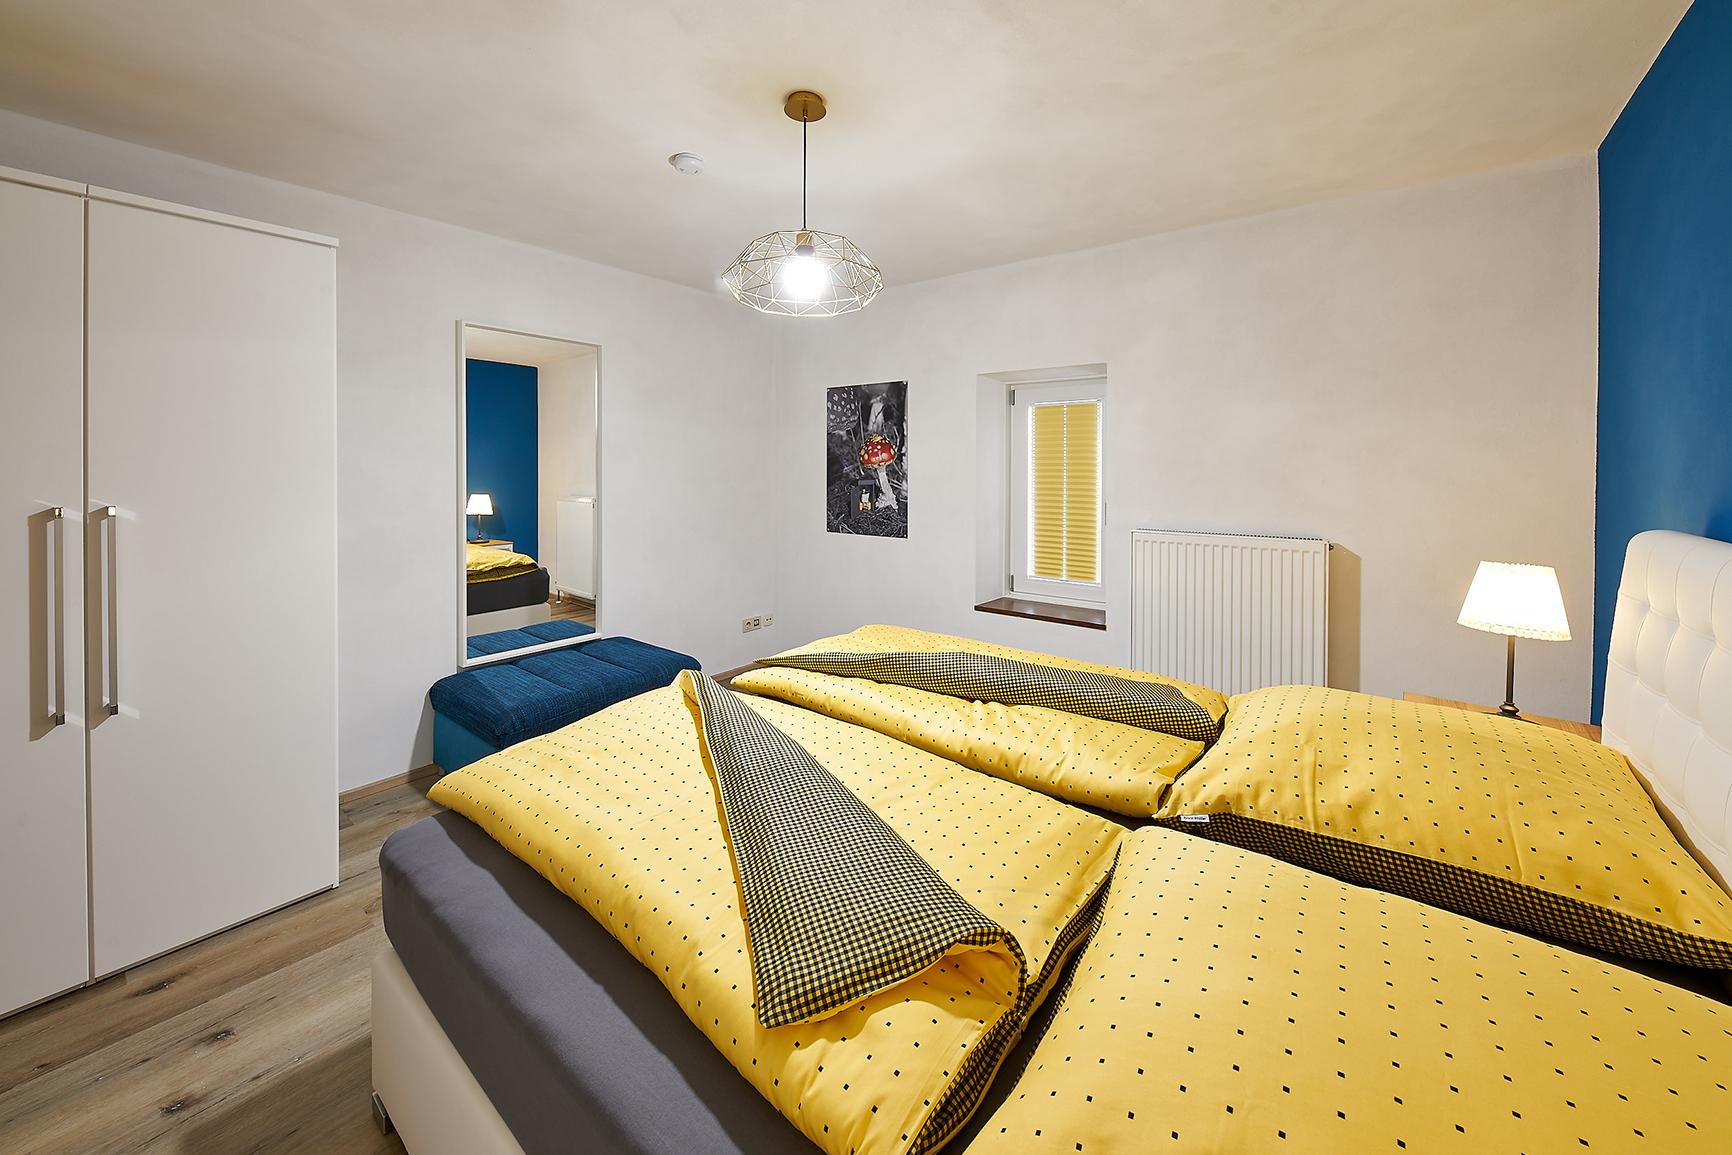 Ferienhaus Mosel-Herberge Schlafzimmer Geschäftemacher